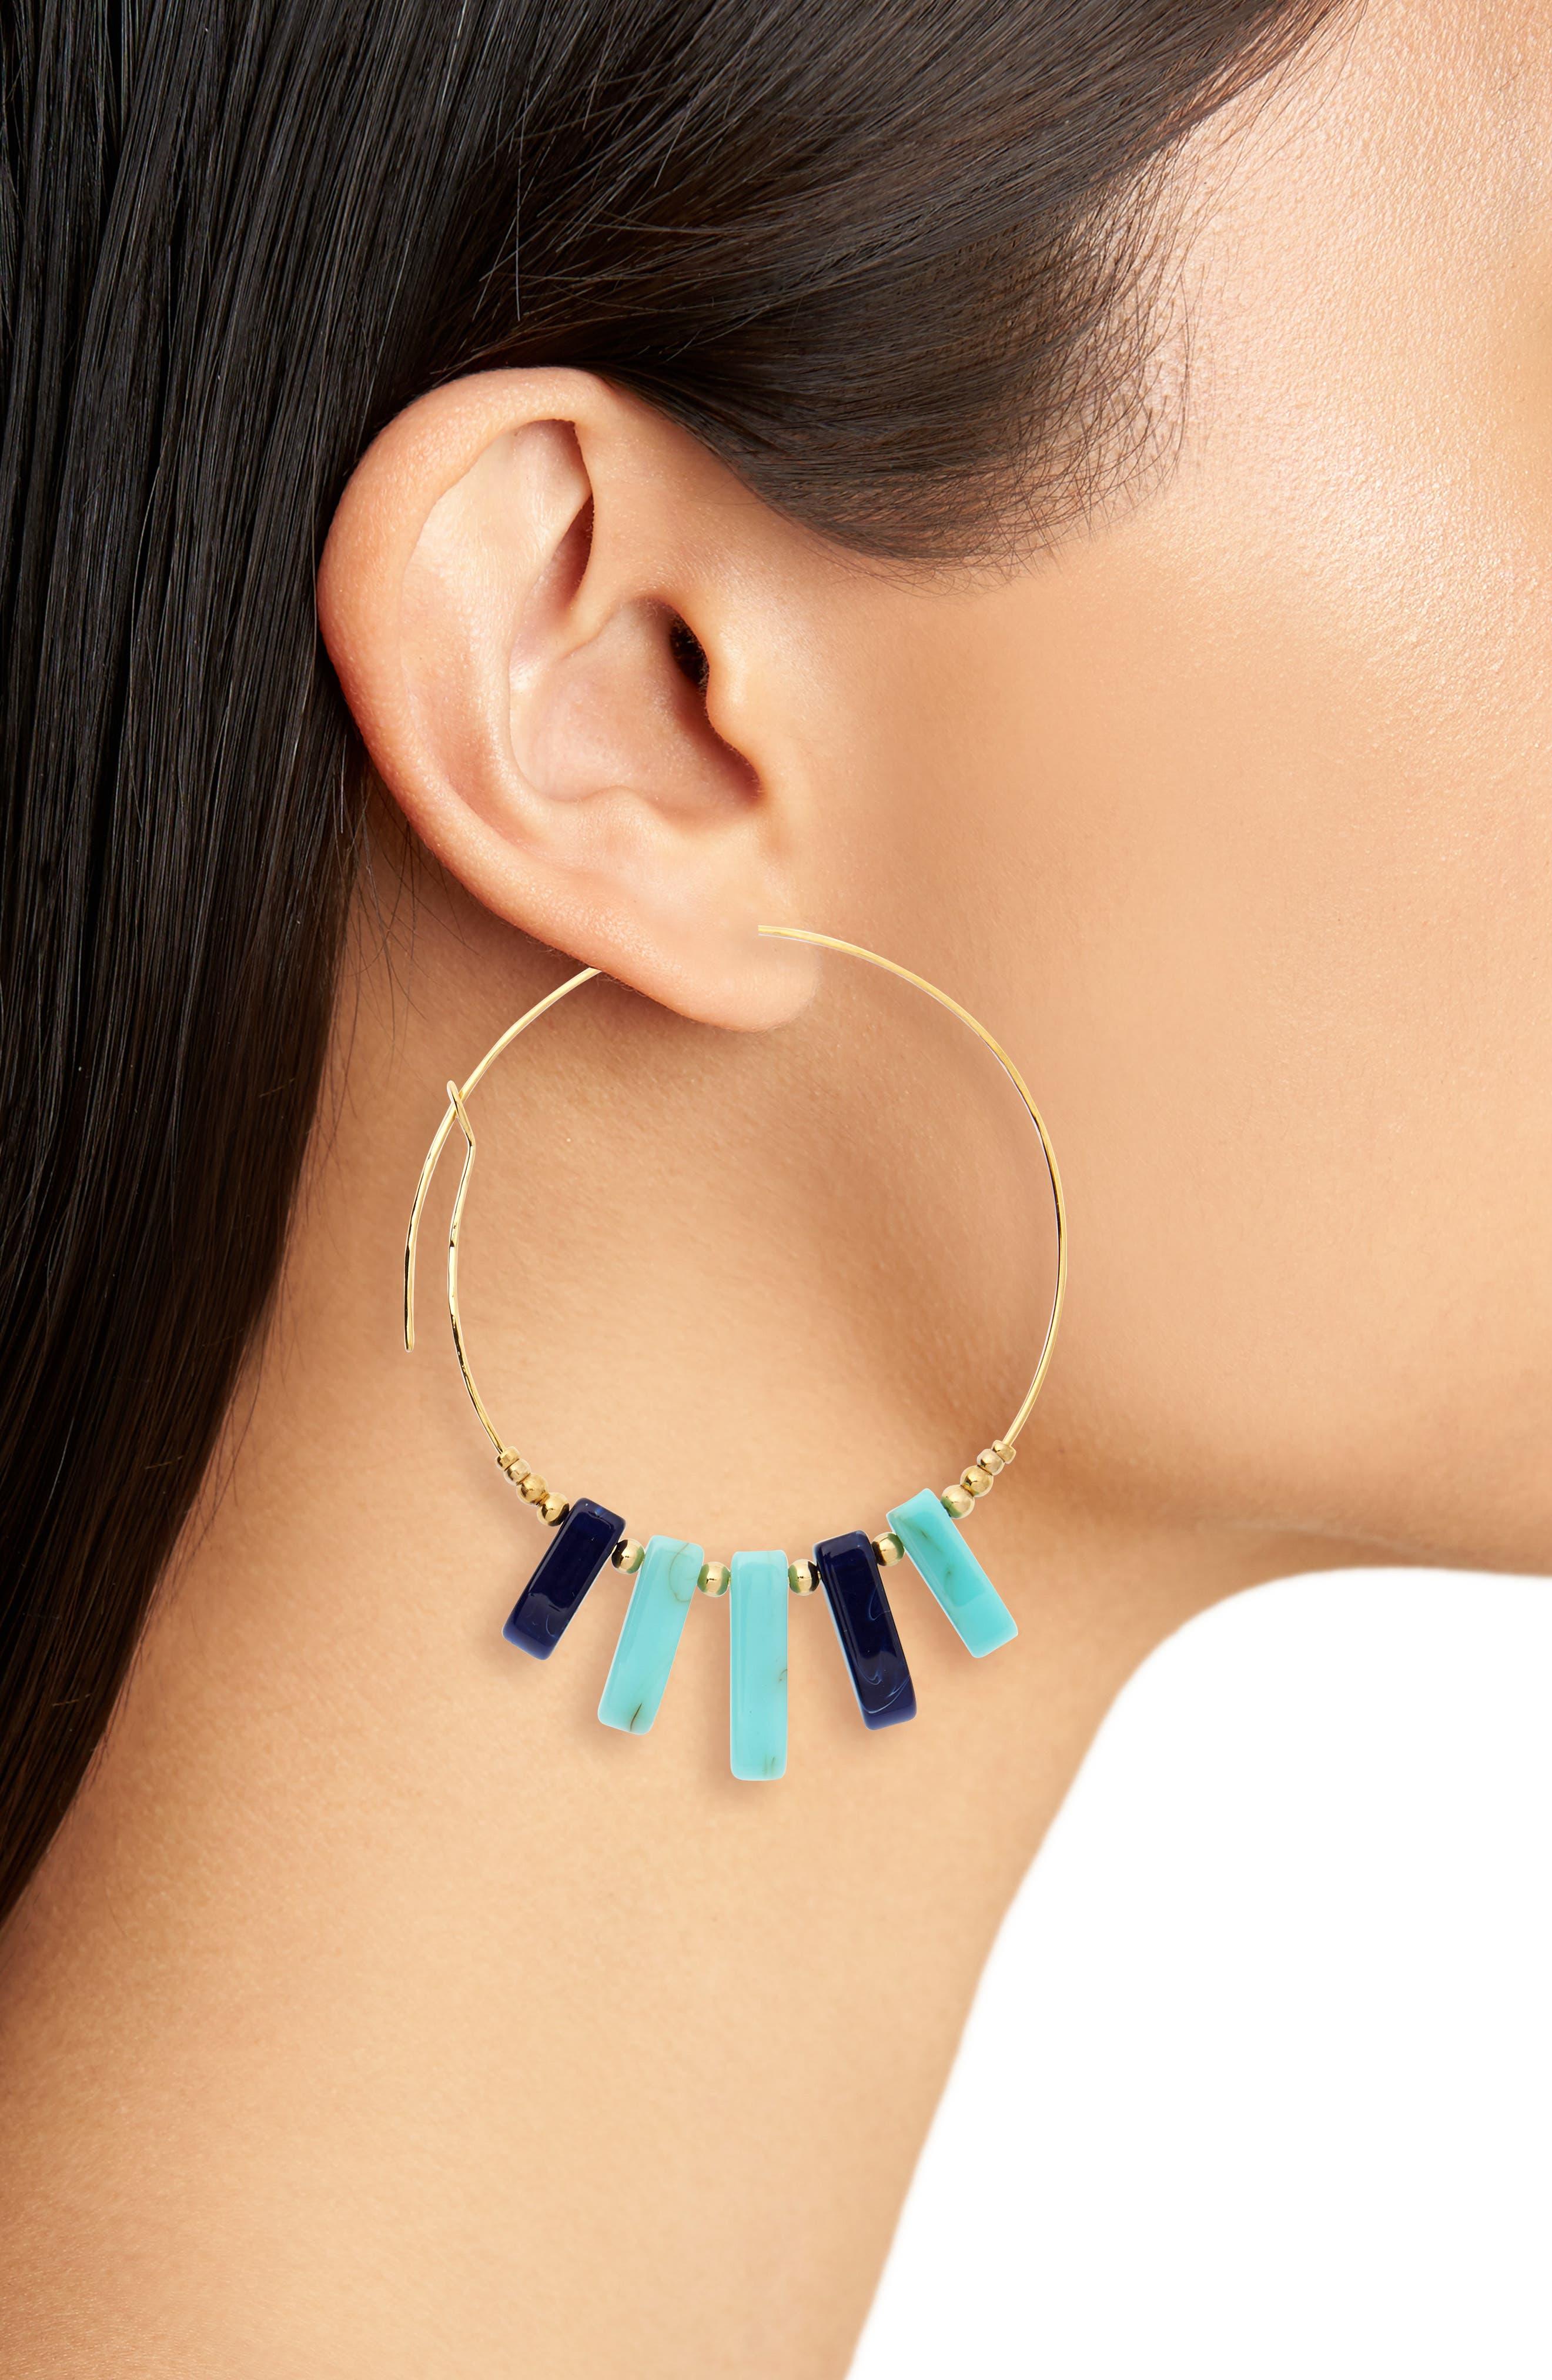 Hoop Earrings,                             Alternate thumbnail 2, color,                             TURQUOISE/ BLUE